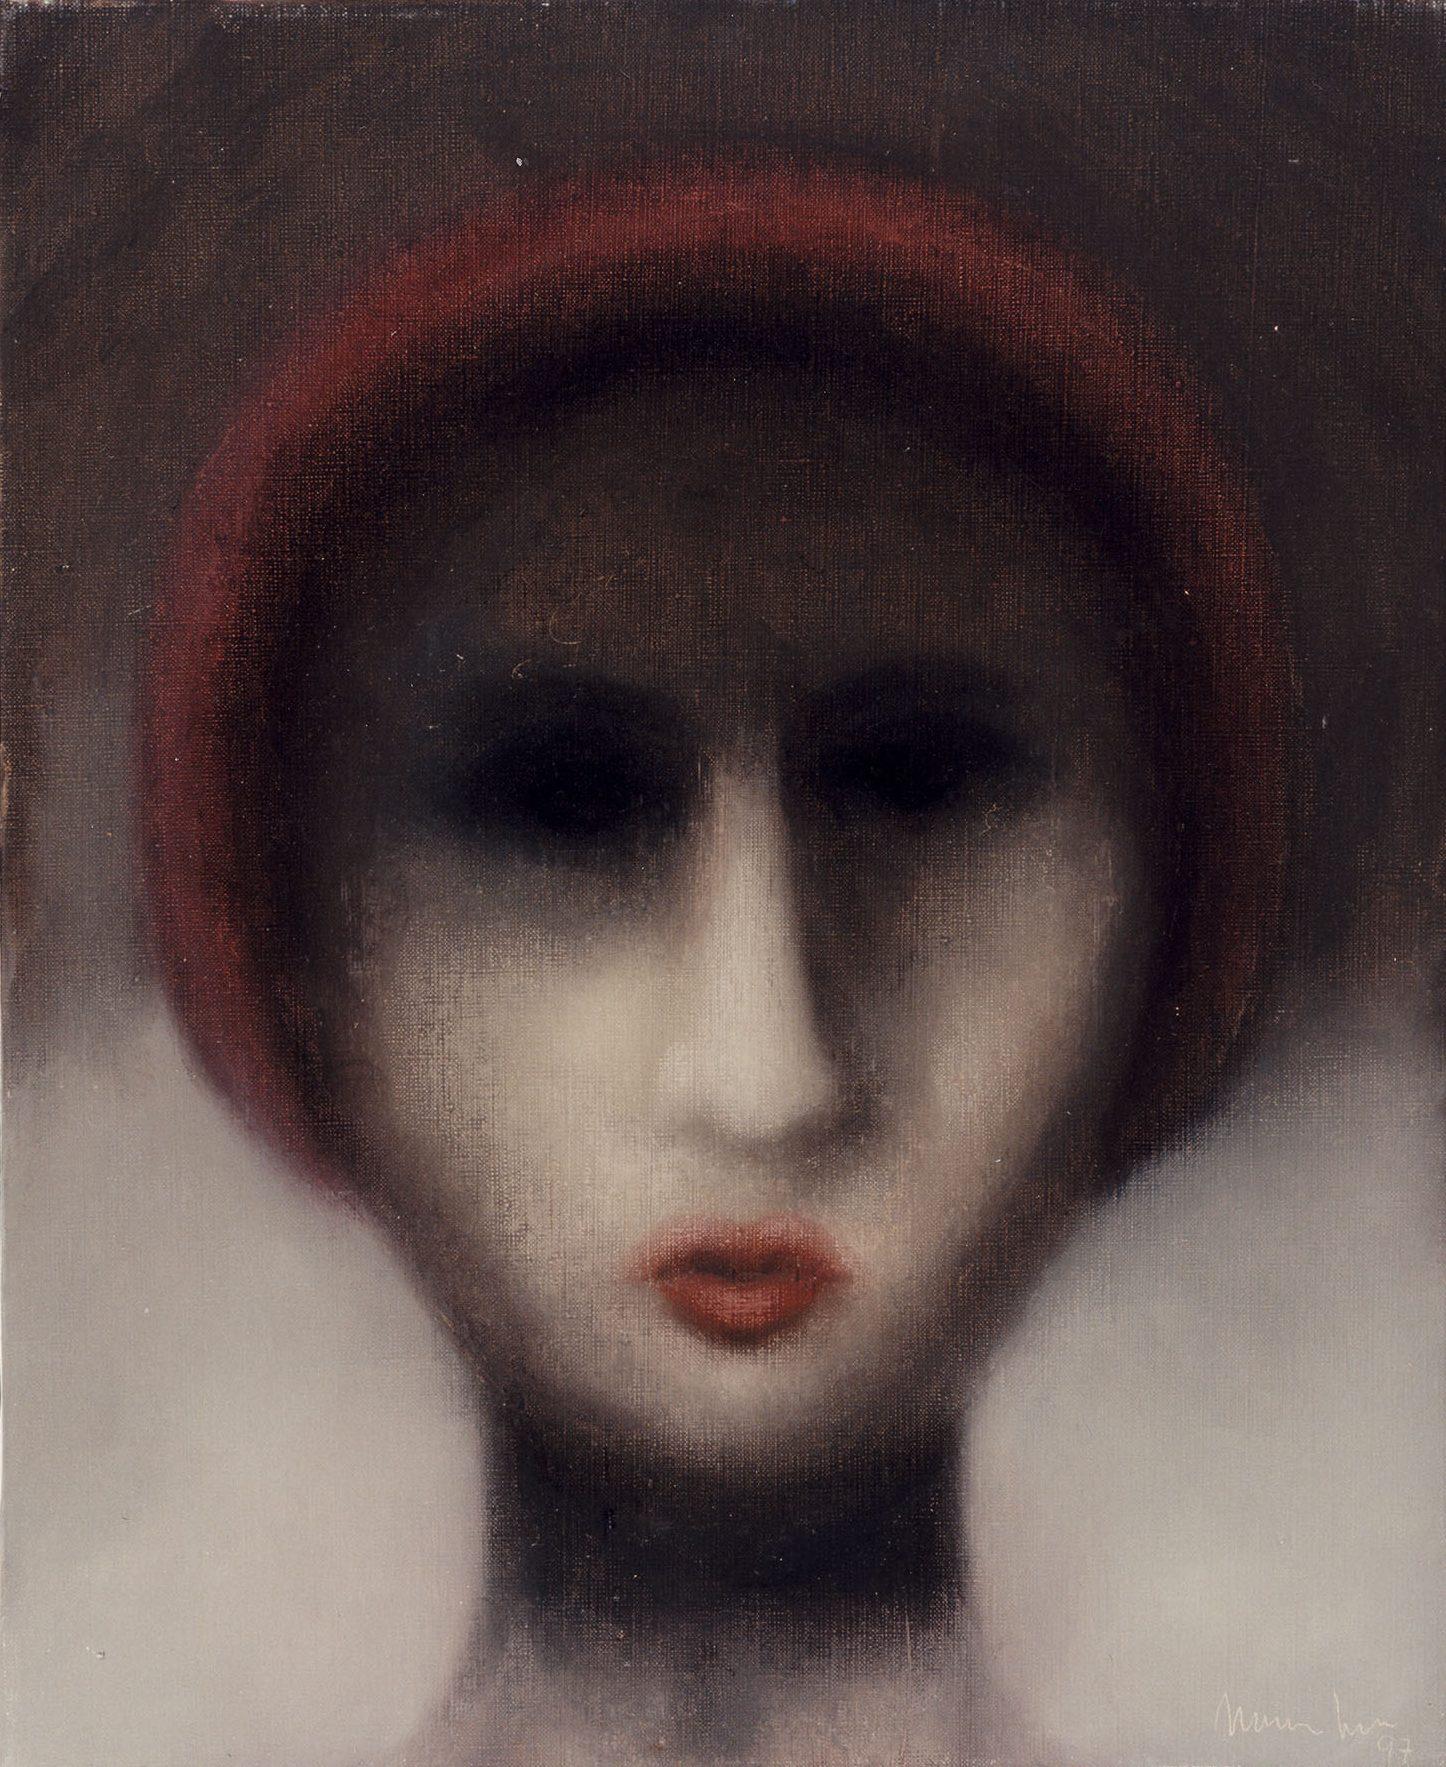 Ombres, 1997, oli sobre tela